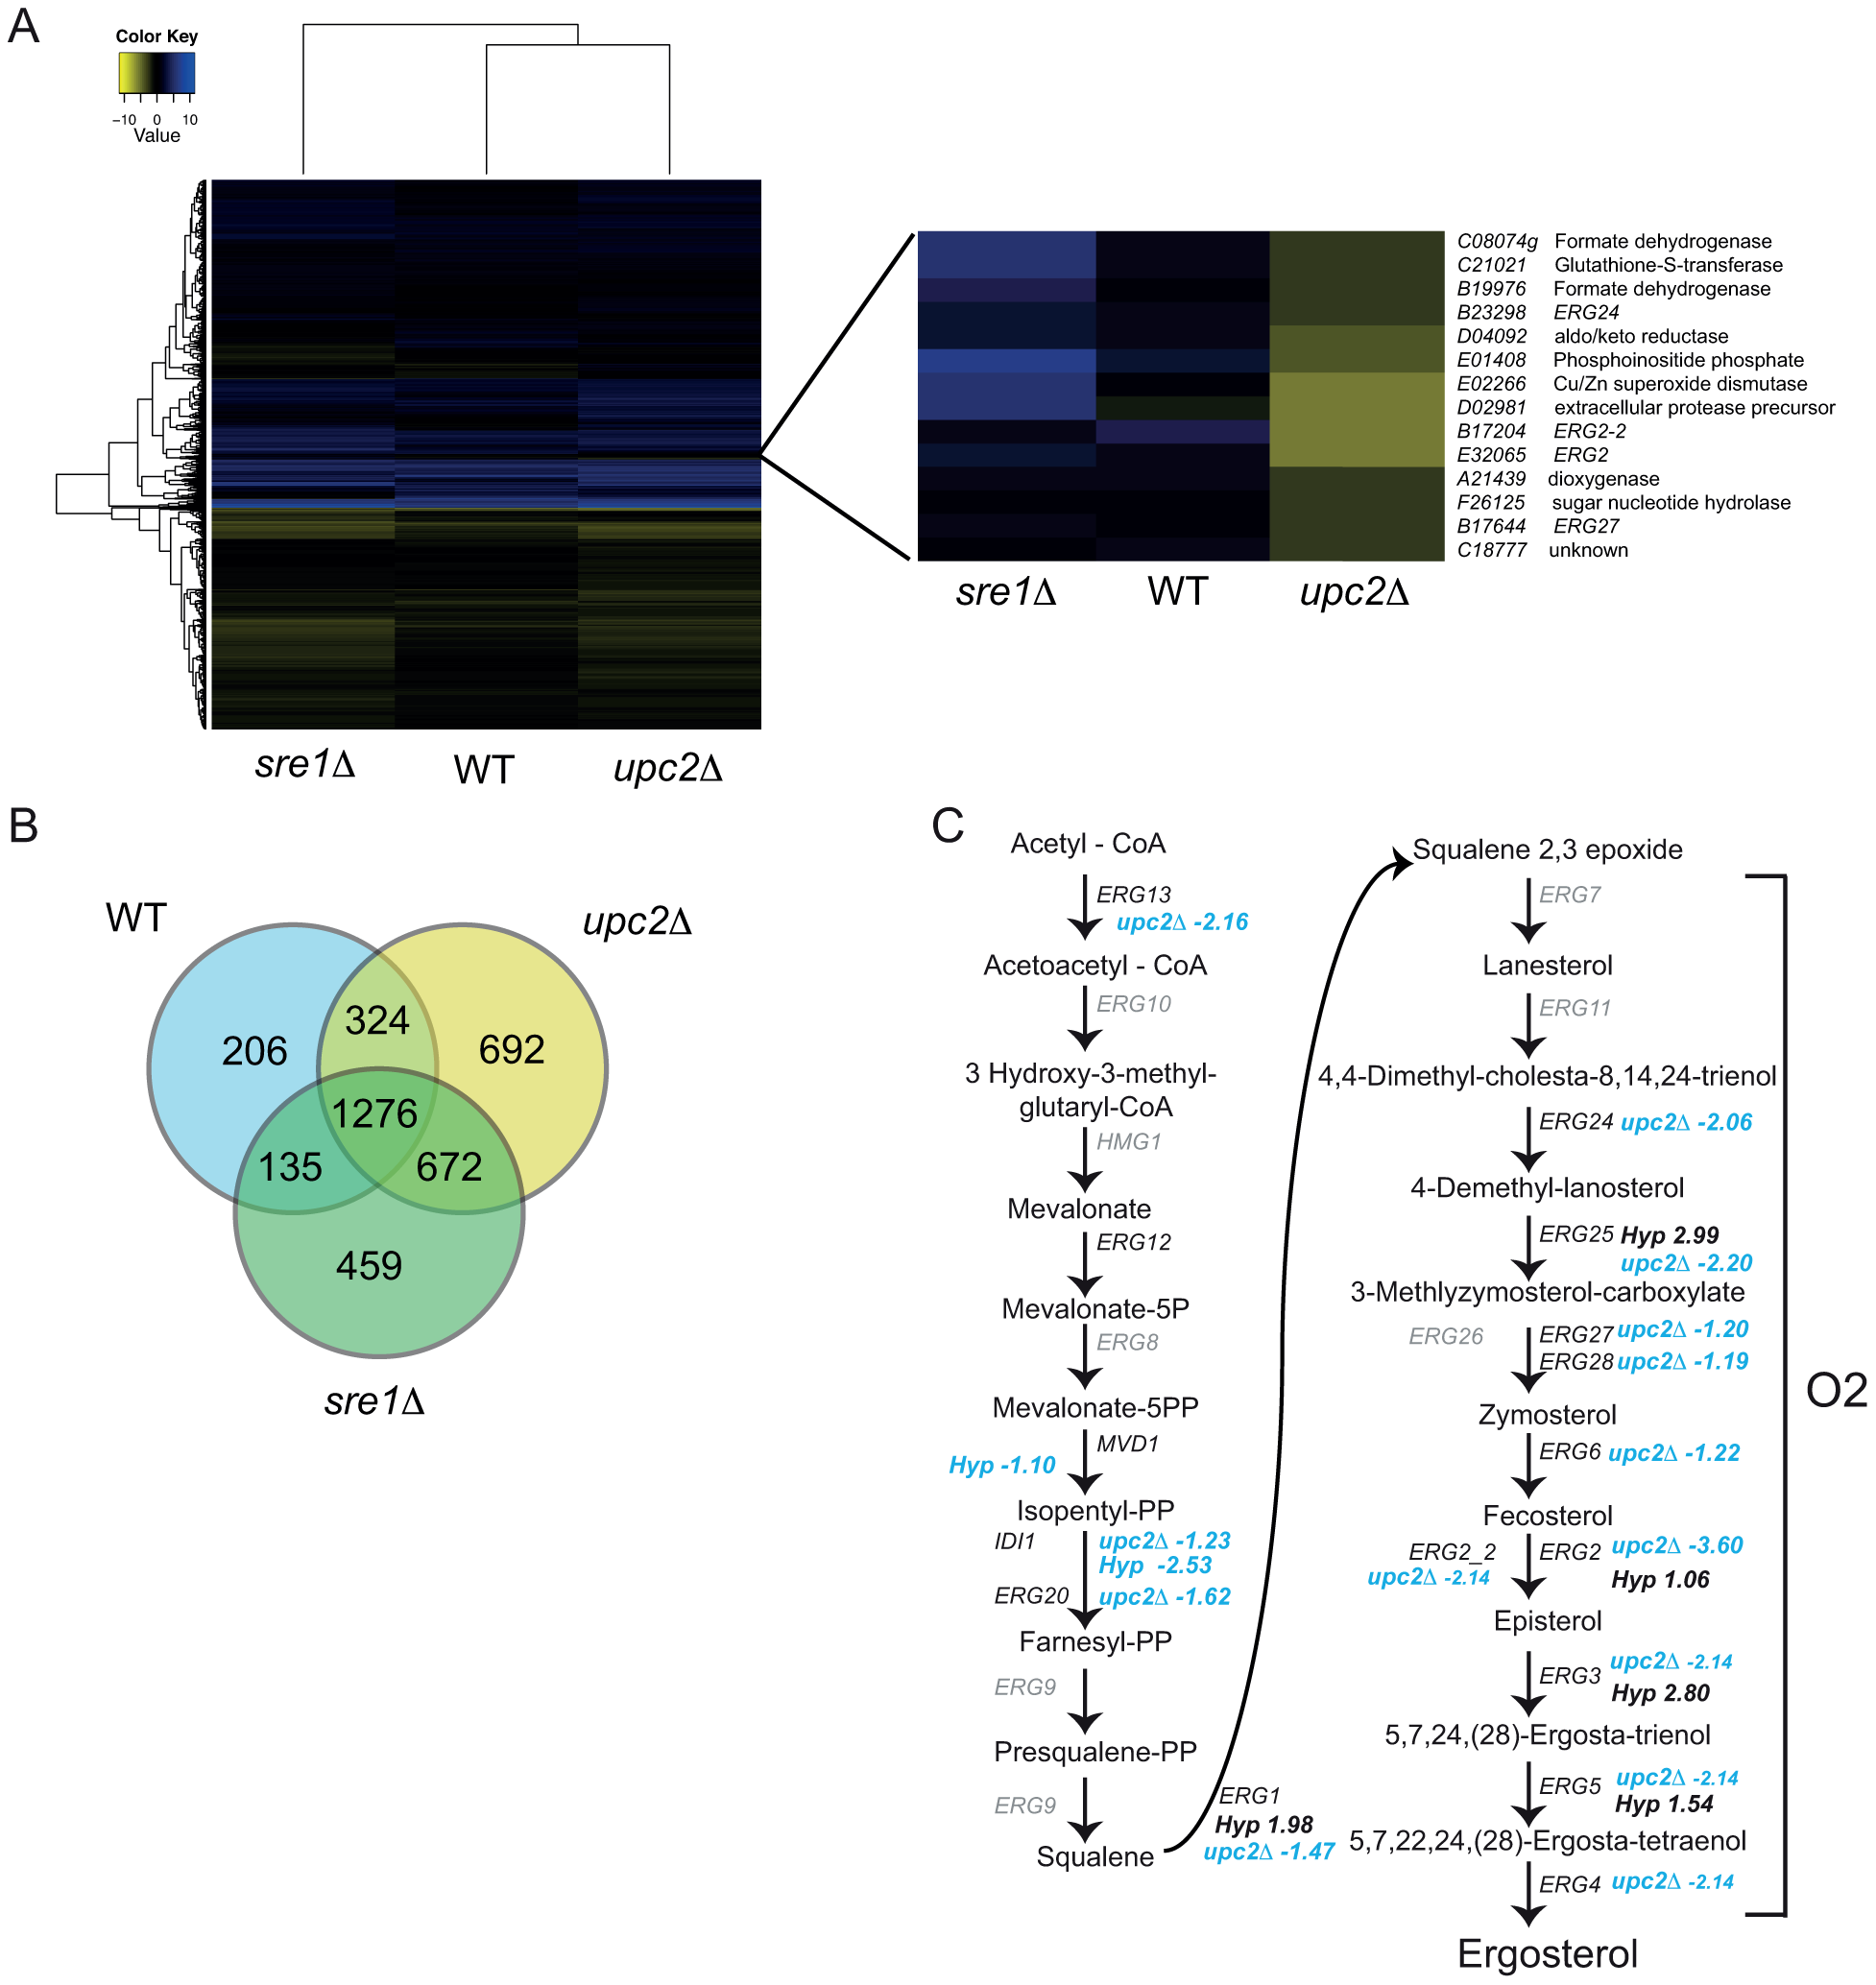 YlUpc2 regulates expression of ergosterol genes.